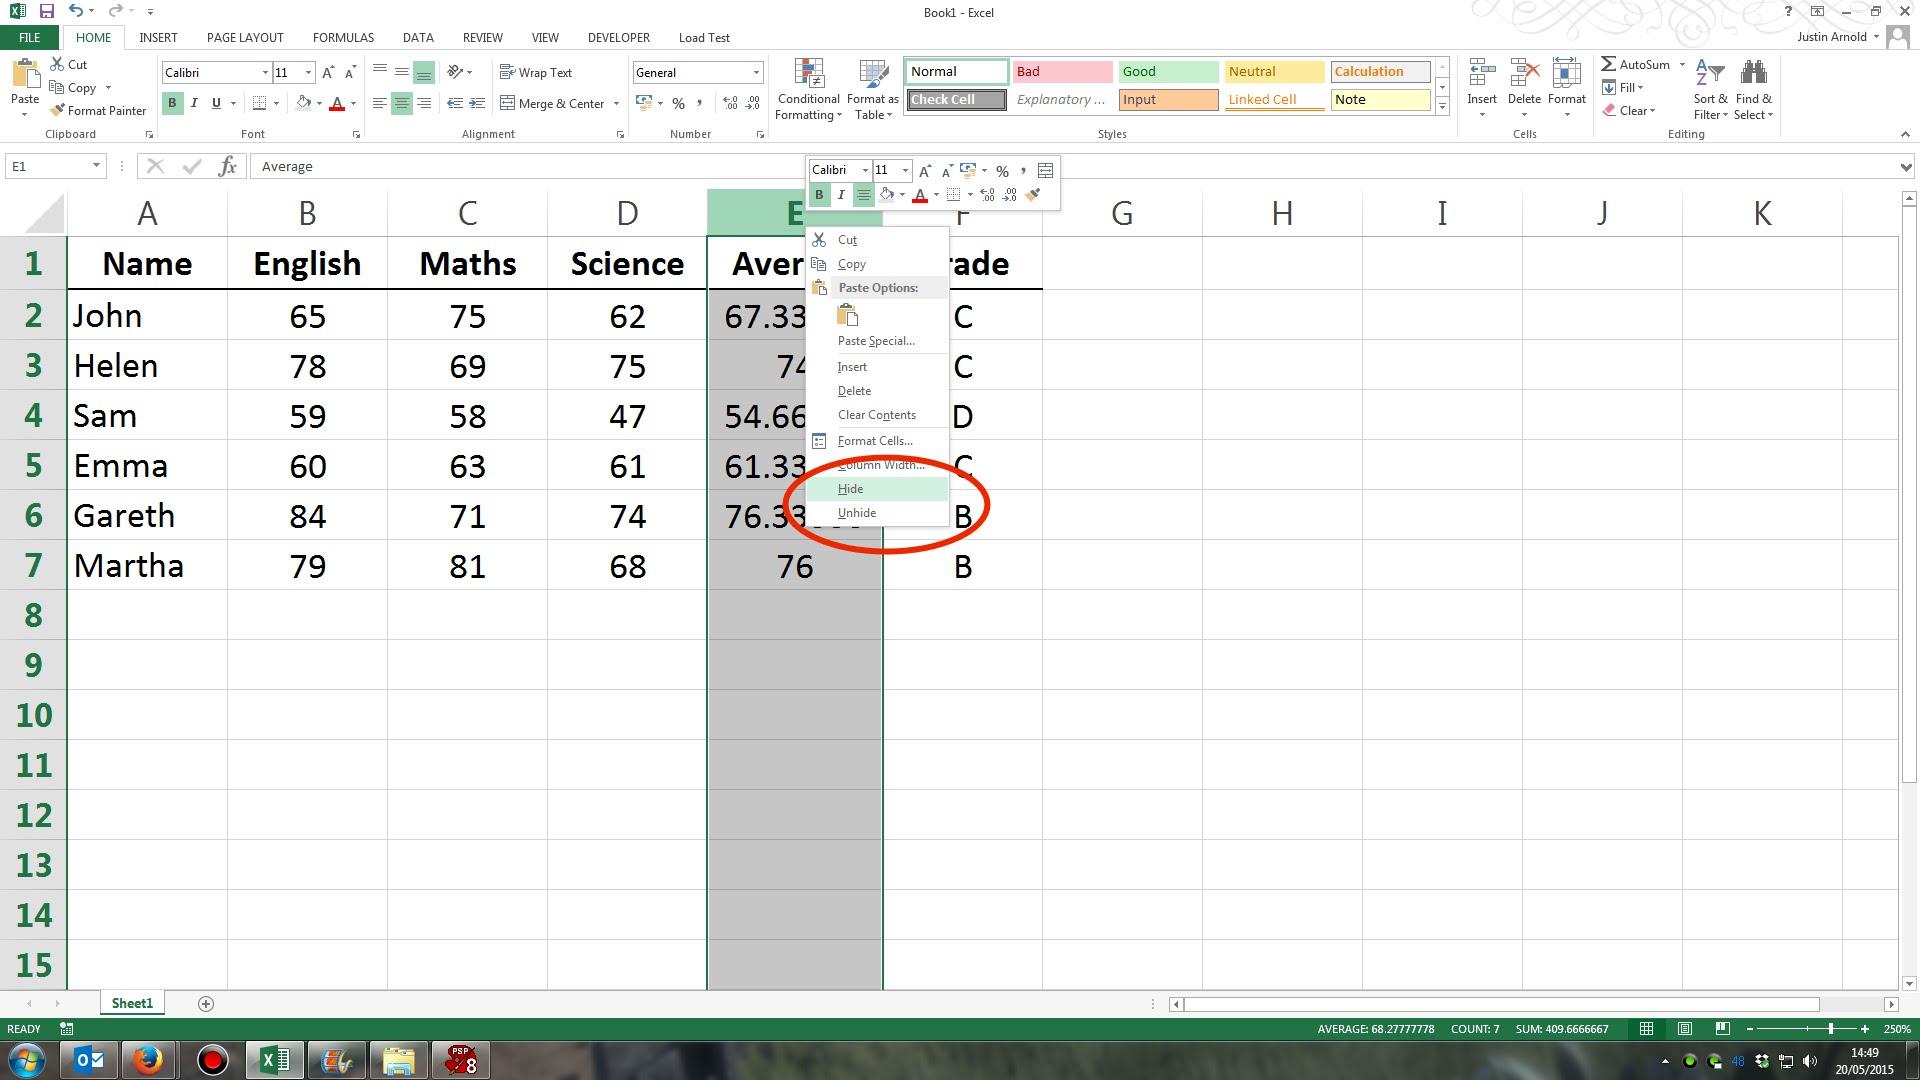 How To Unhide Hidden Columns In Excel